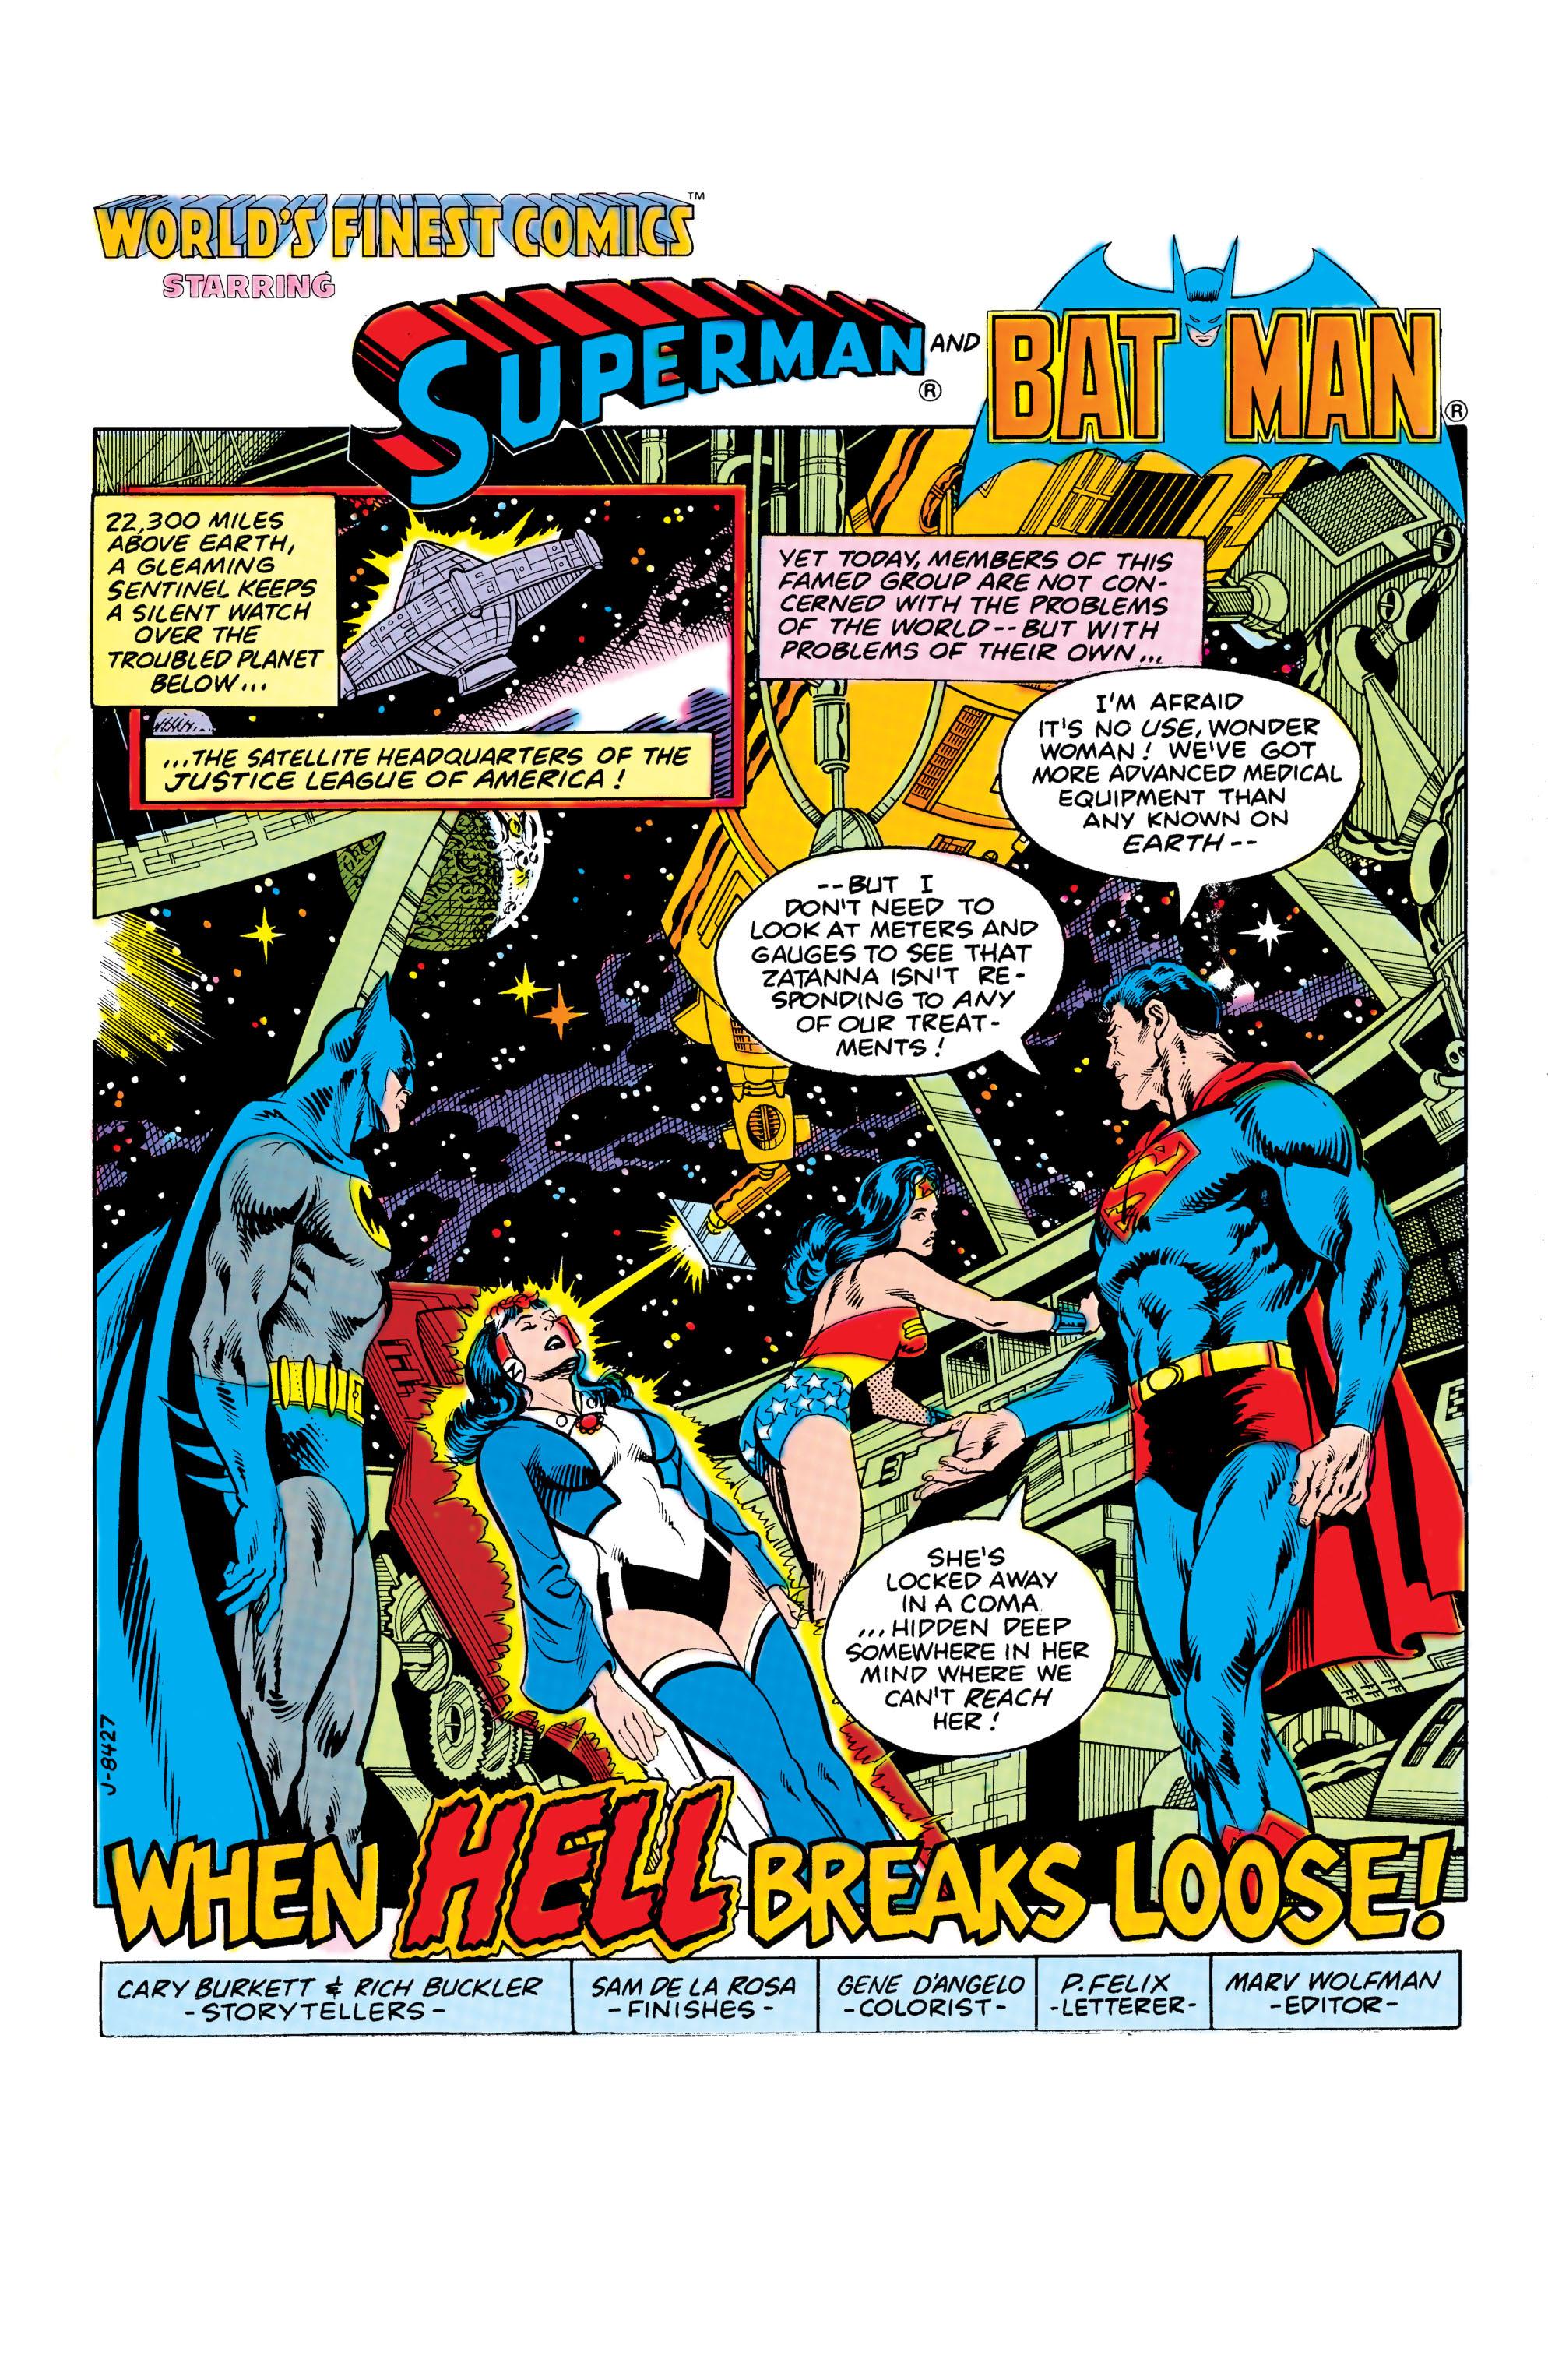 Read online World's Finest Comics comic -  Issue #286 - 2